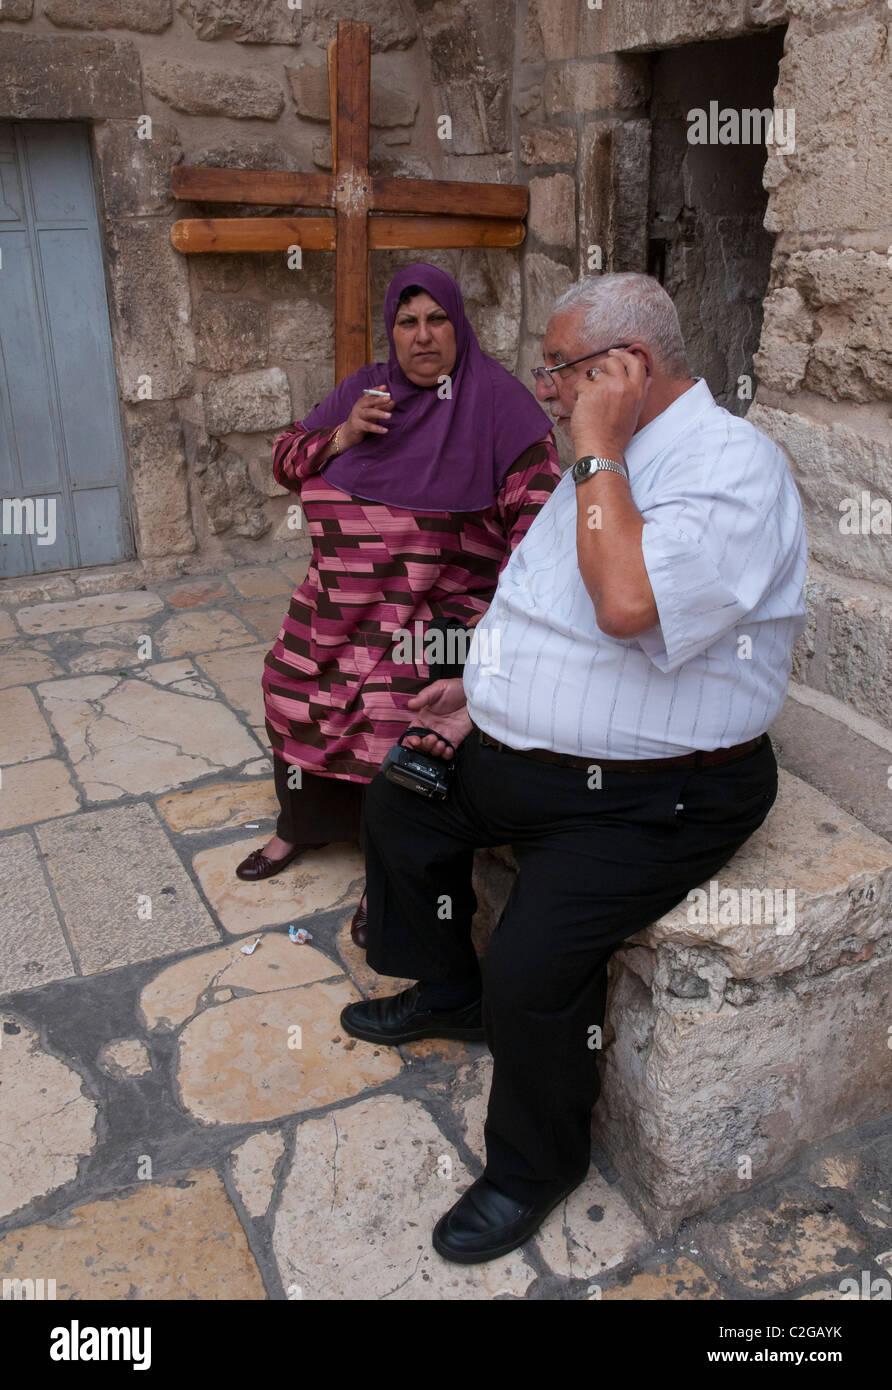 palestinian elderly and overweight couple. Holy Sepulcher. Jerusalem Old City - Stock Image